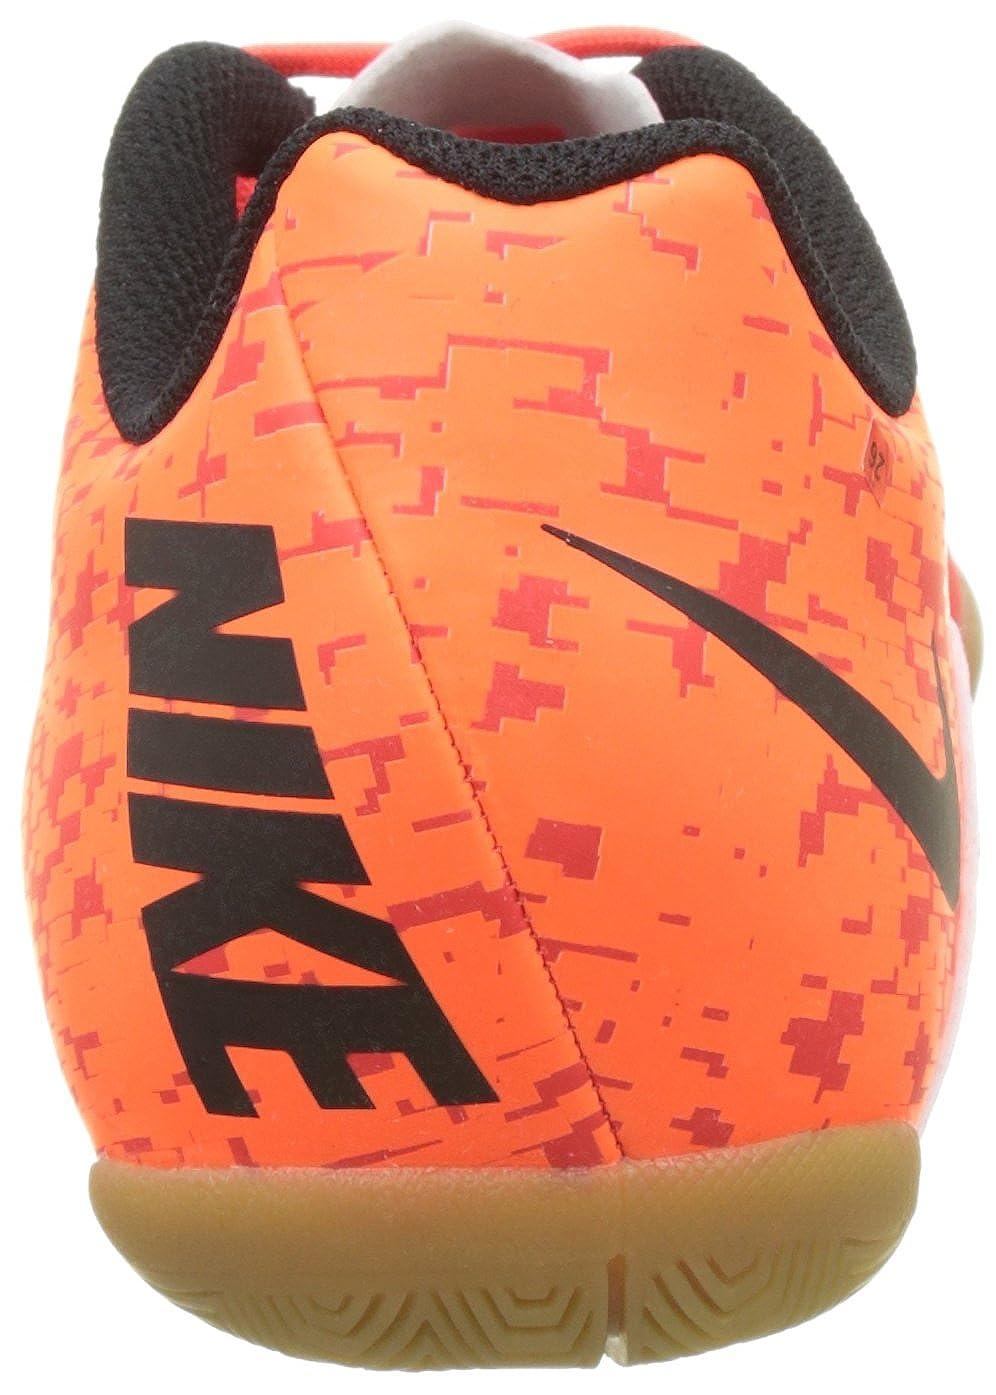 Zapatos Bombax es Ic Nike Zapatillas Hombre Amazon Para Fútbol De zwdOq6